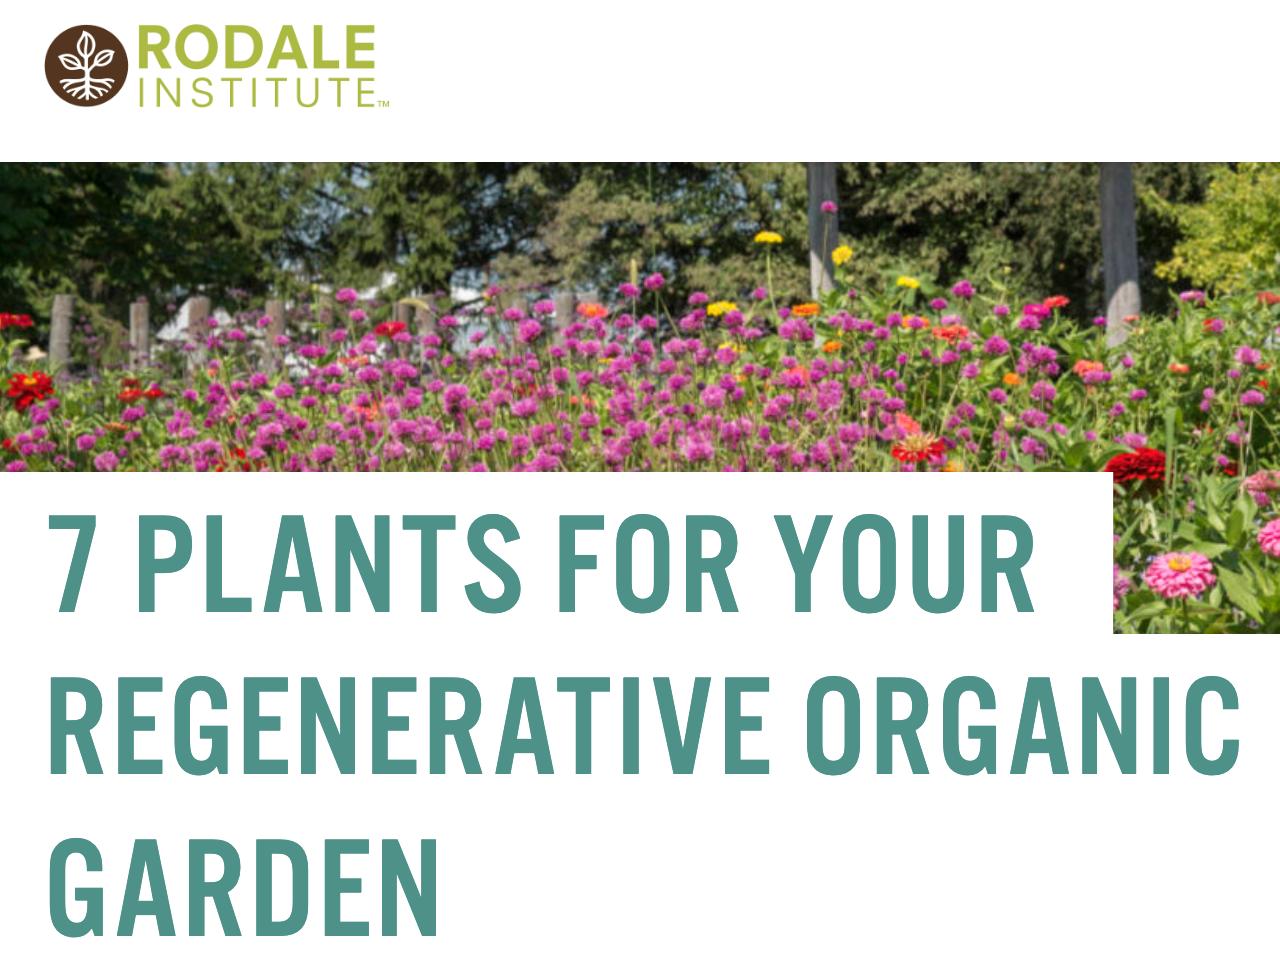 7 plants for your regenerative organic garden ,  Rodale Institute